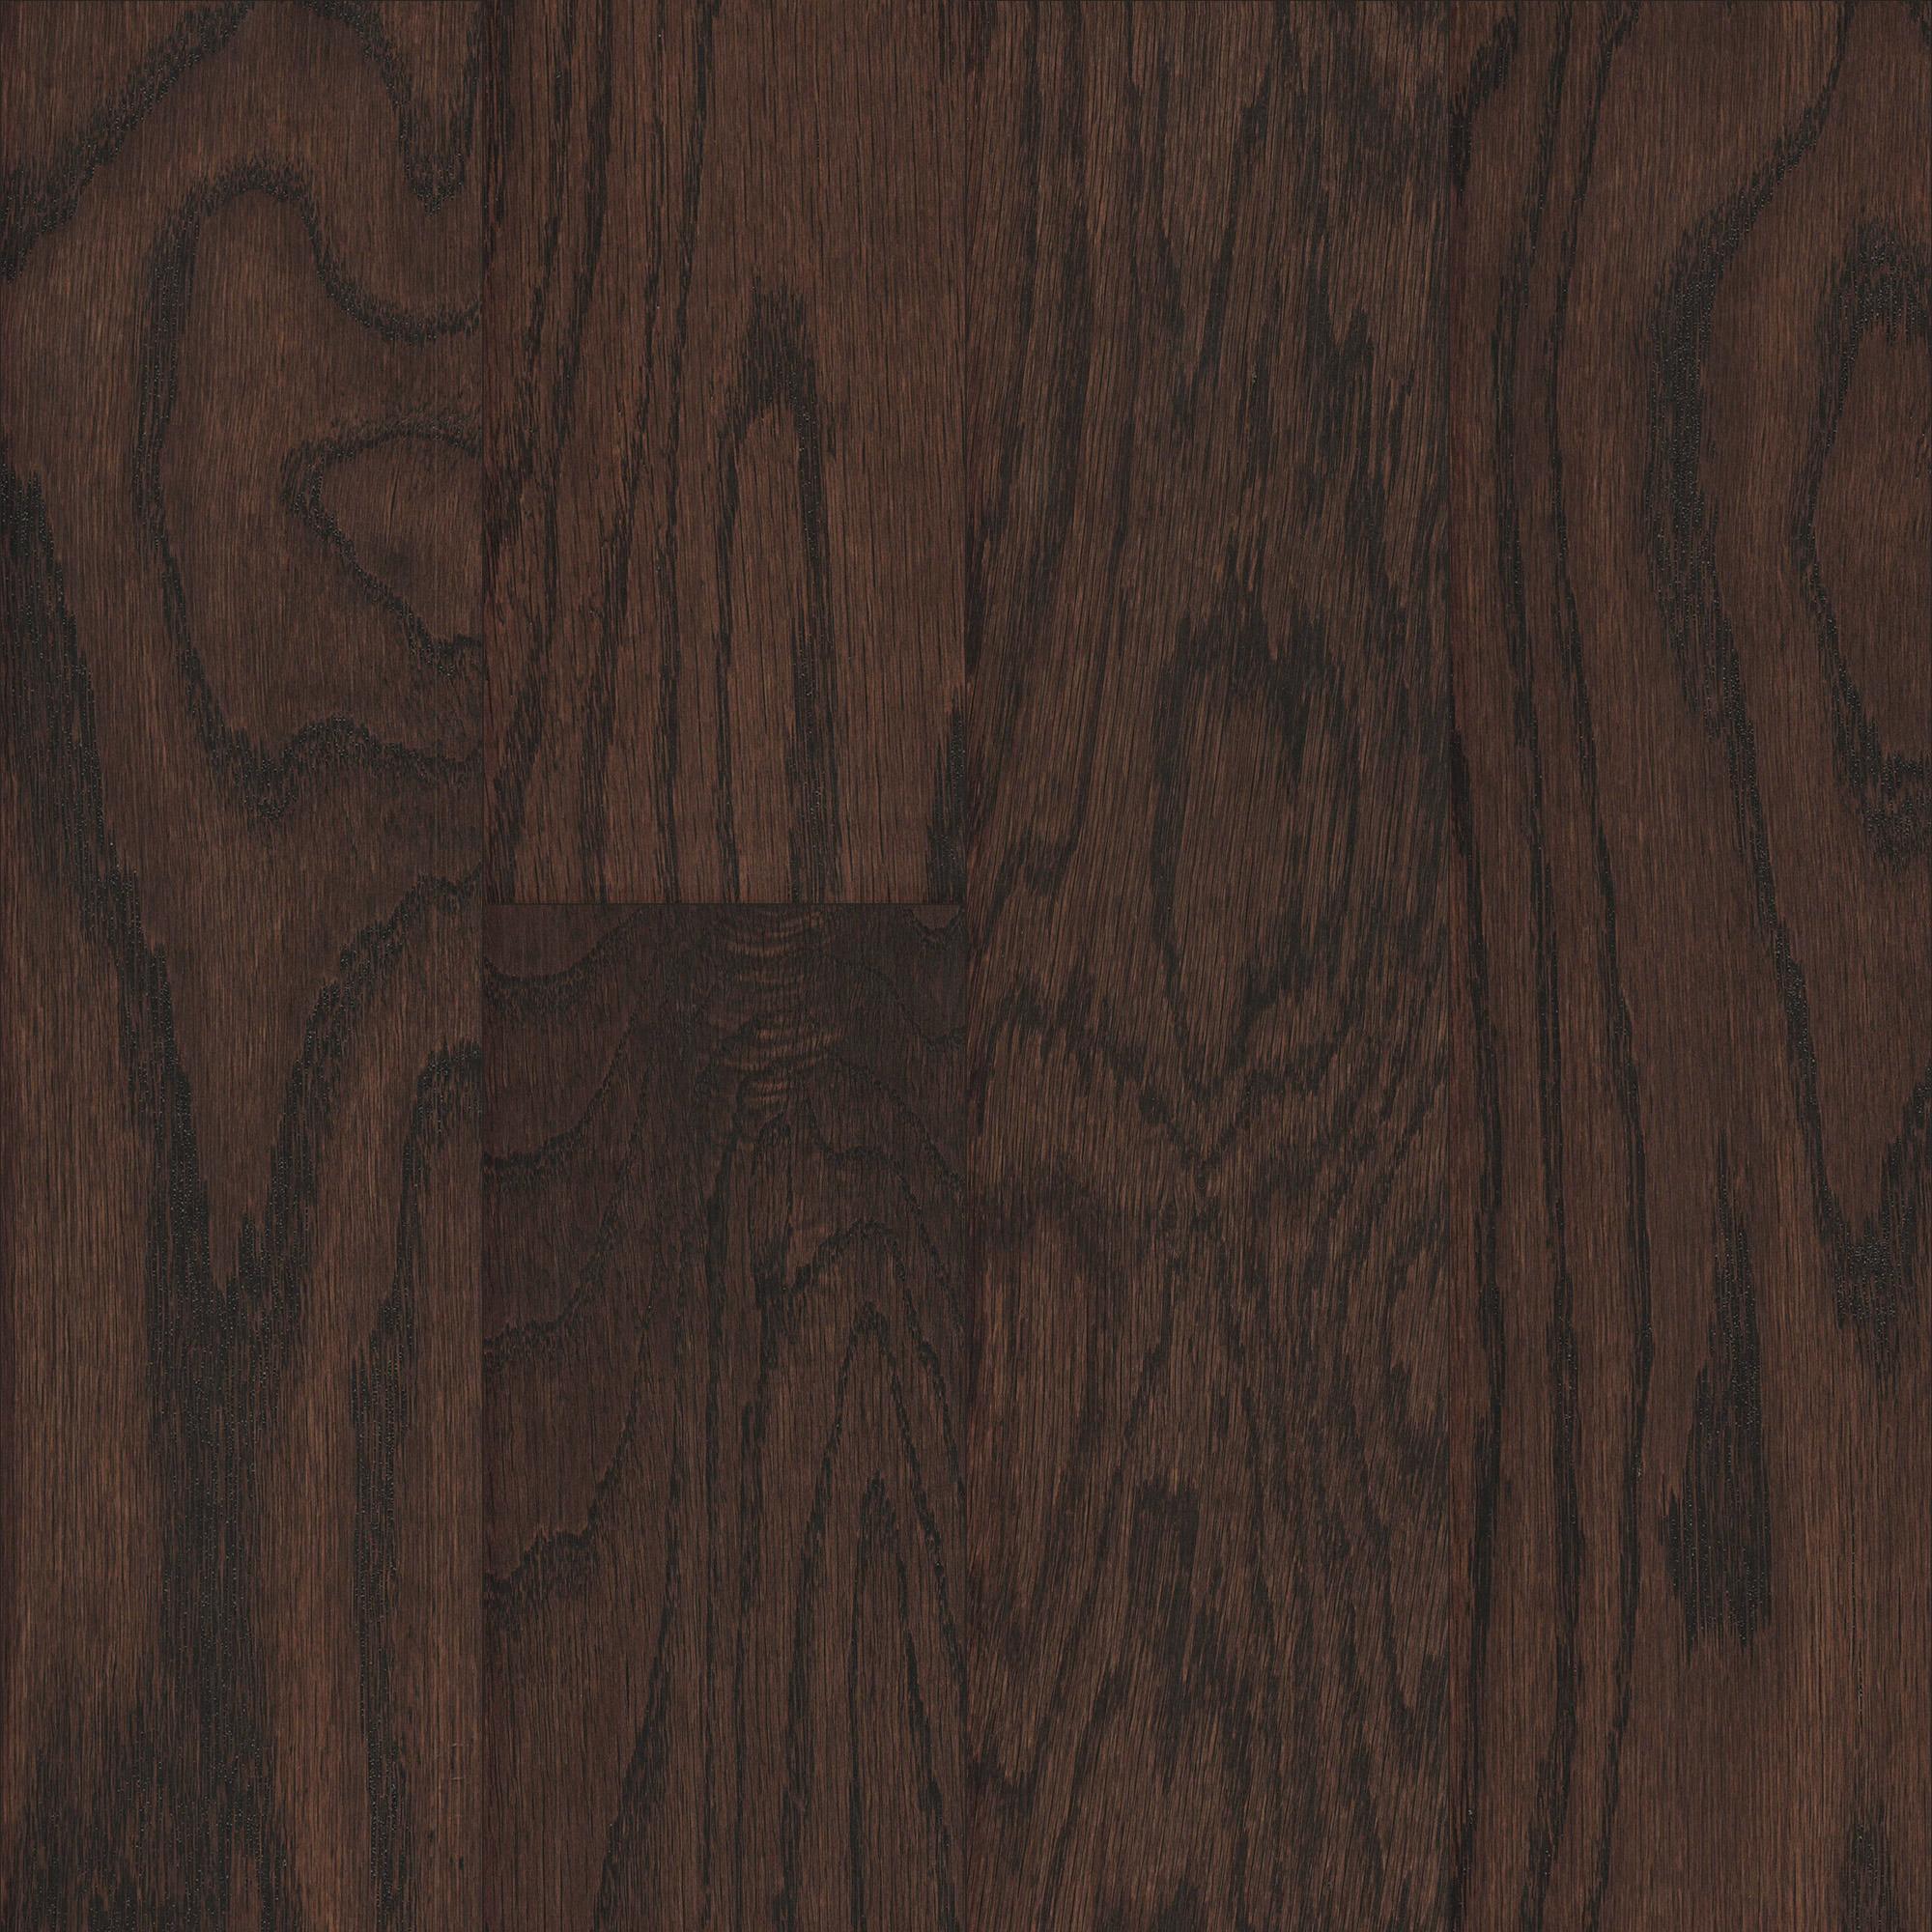 armstrong engineered maple hardwood flooring of mullican ridgecrest oak burnt umber 1 2 thick 5 wide engineered with regard to mullican ridgecrest oak burnt umber 1 2 thick 5 wide engineered hardwood flooring